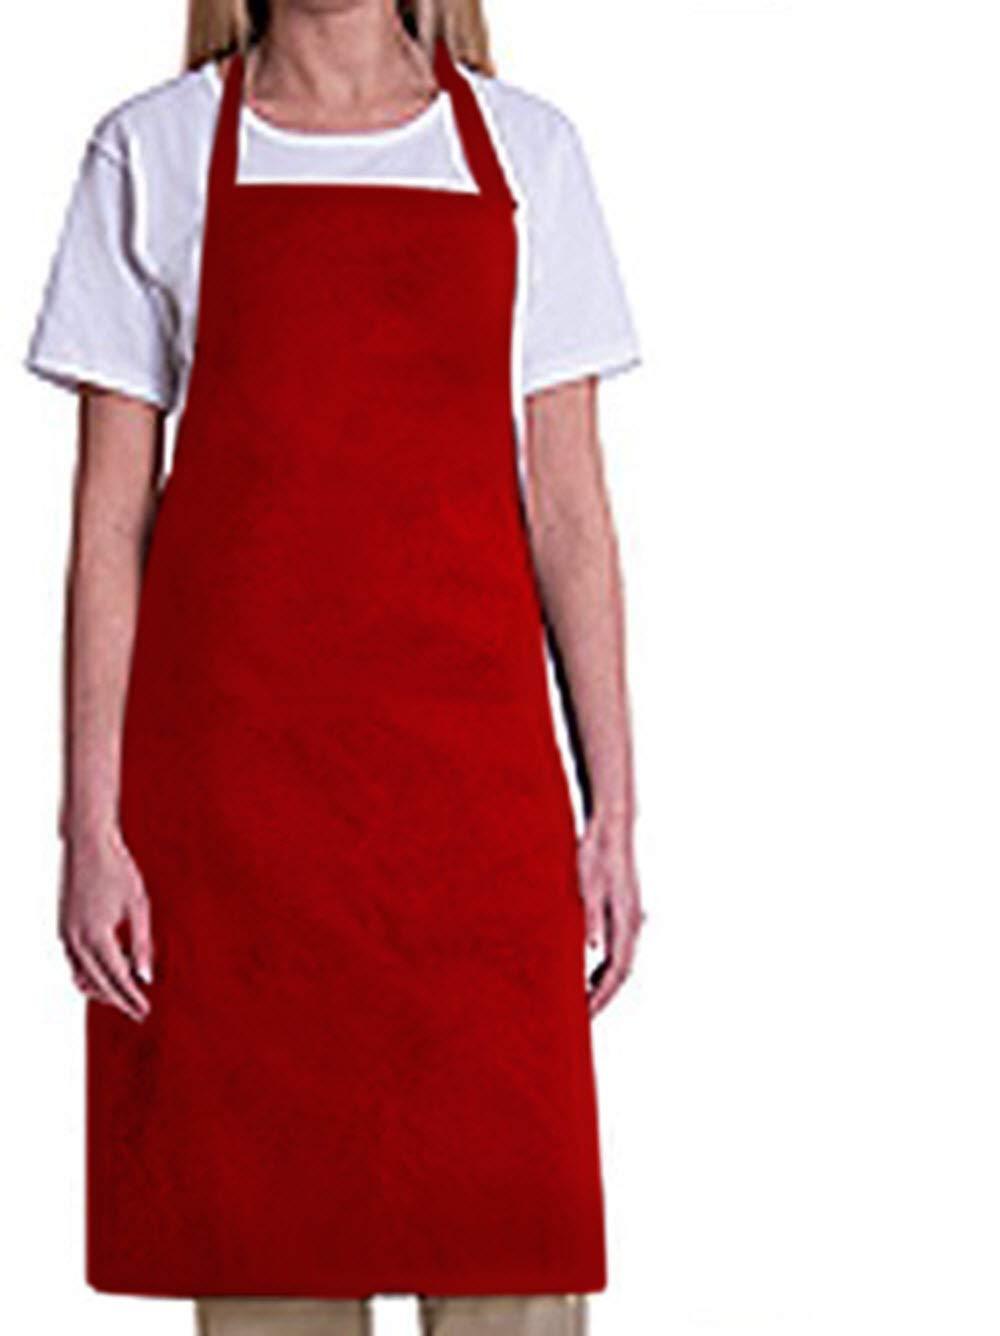 Bib Aprons-MHF Aprons-1 Piece Pack-2 Waist Pockets- New Spun Poly-commercial Restaurant Kitchen-(Black) MHFAPRN2